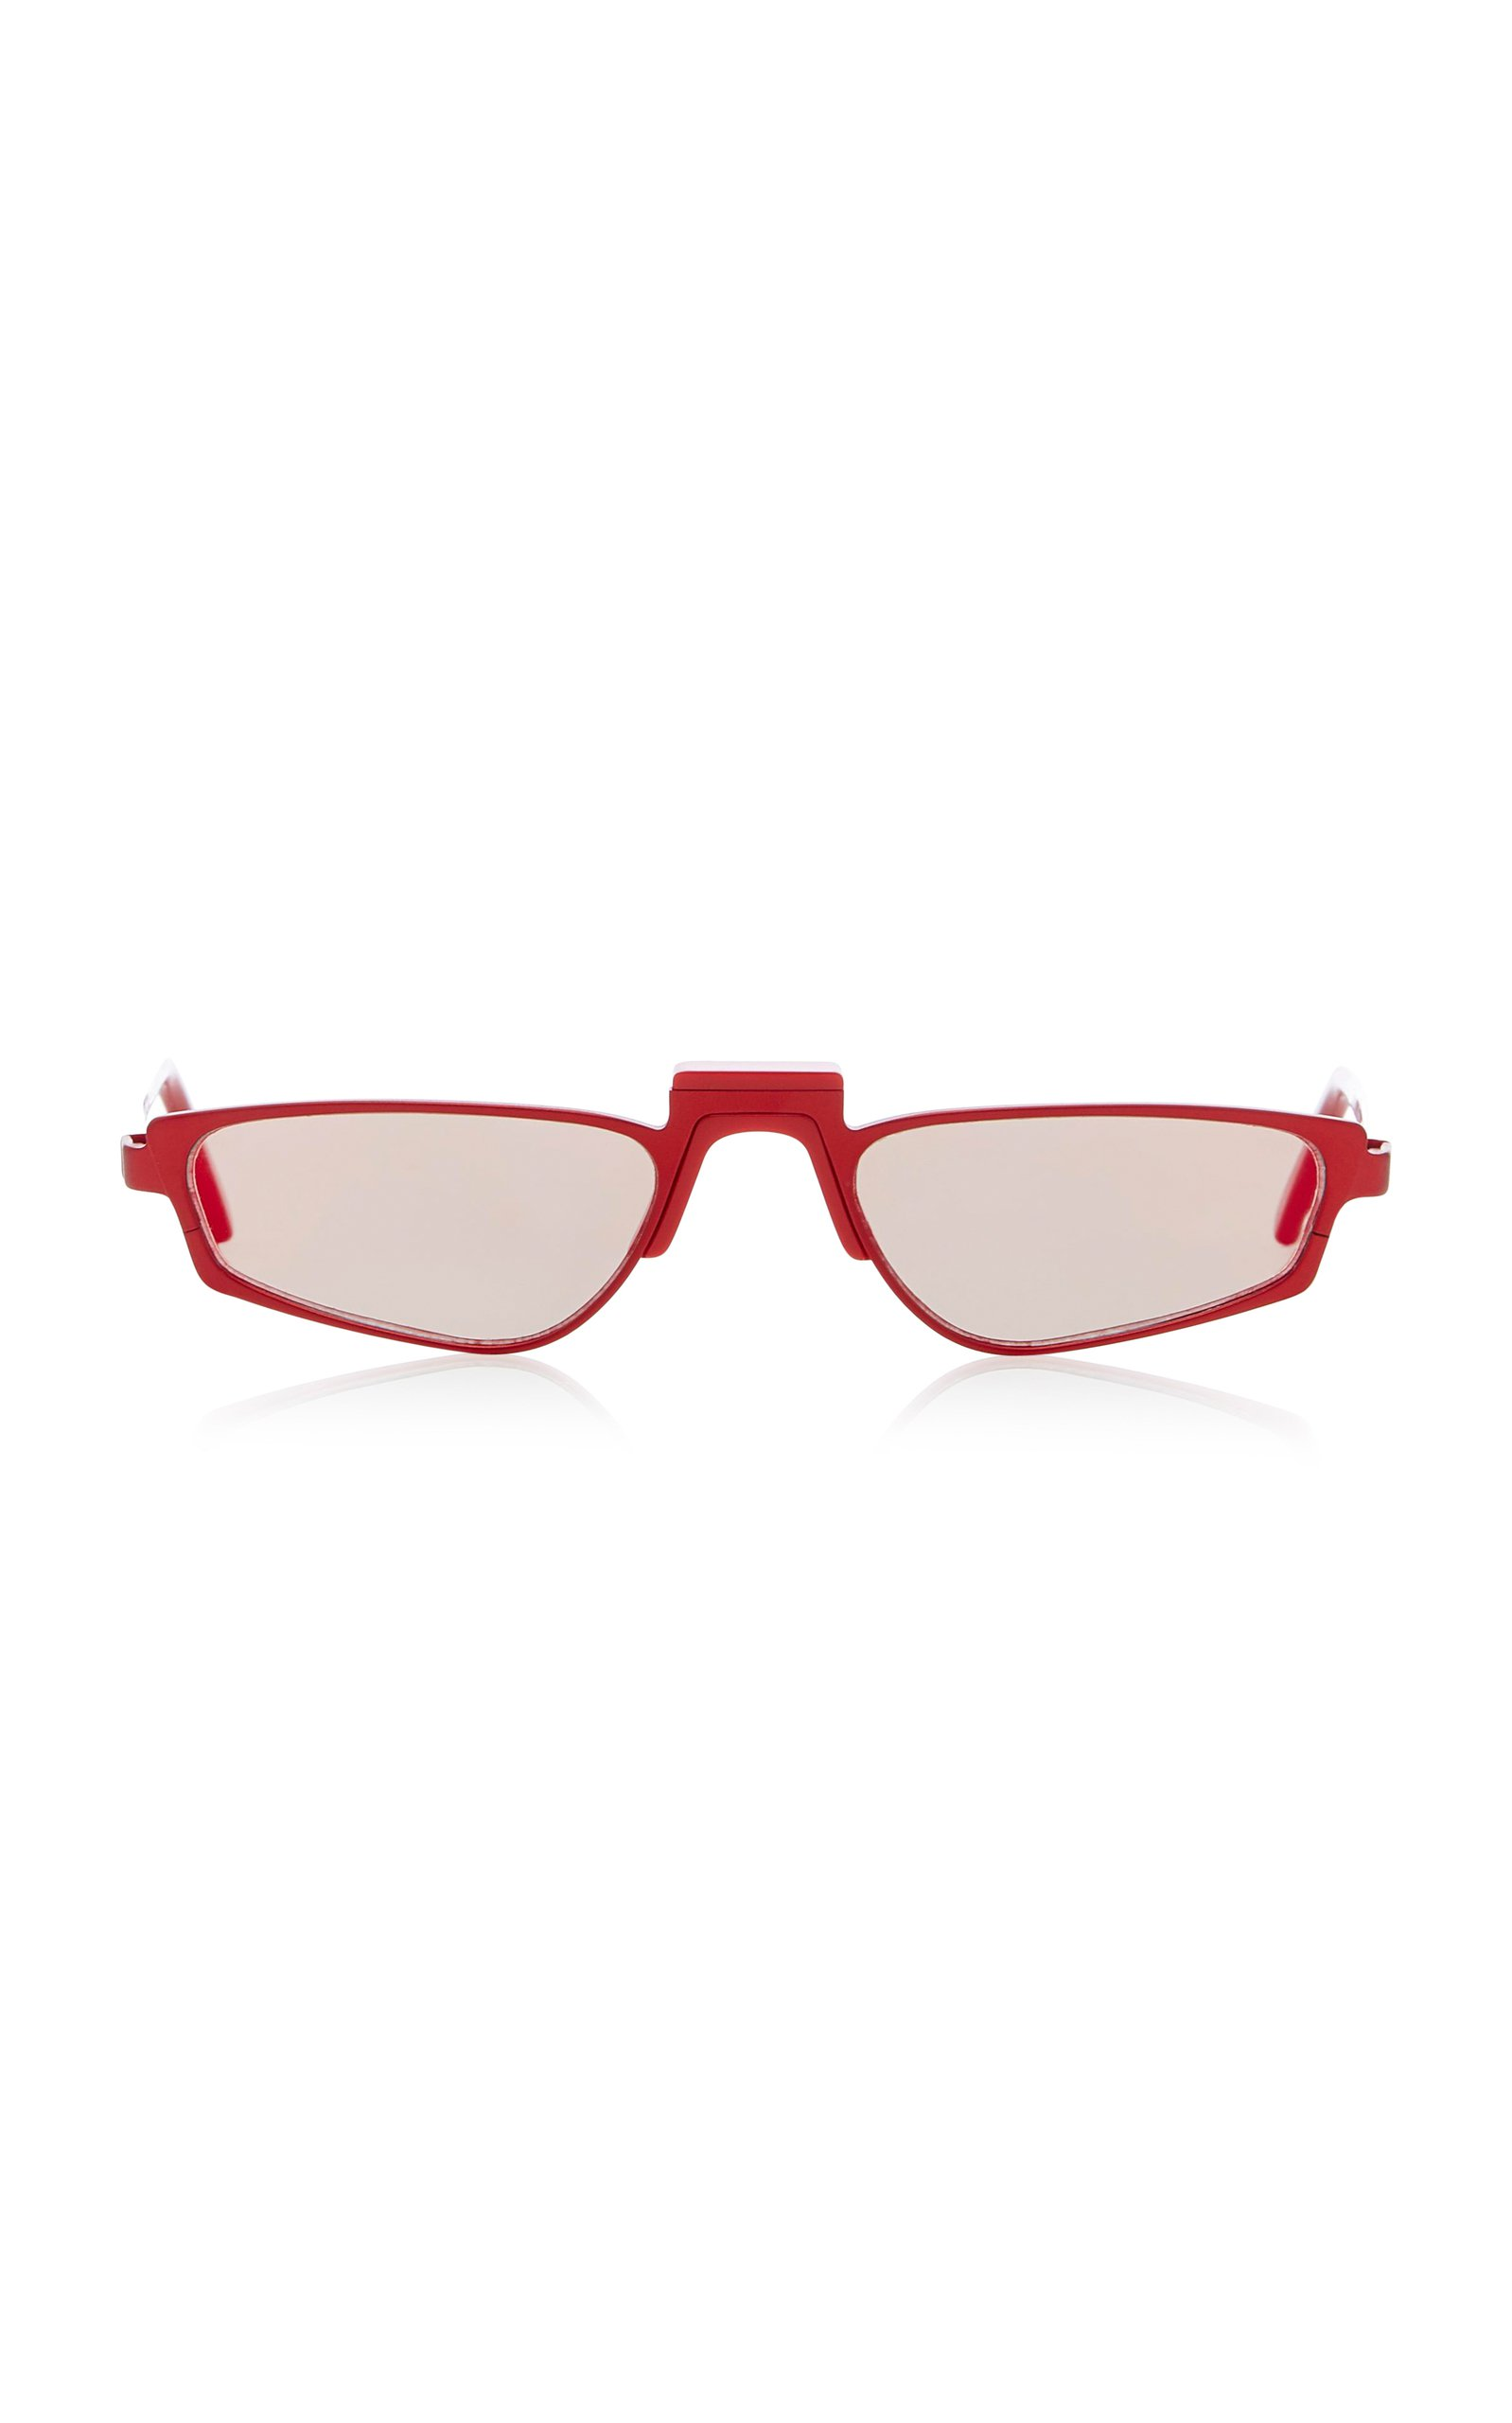 Andy Wolf Eyewear Ojala Acetate Sunglasses